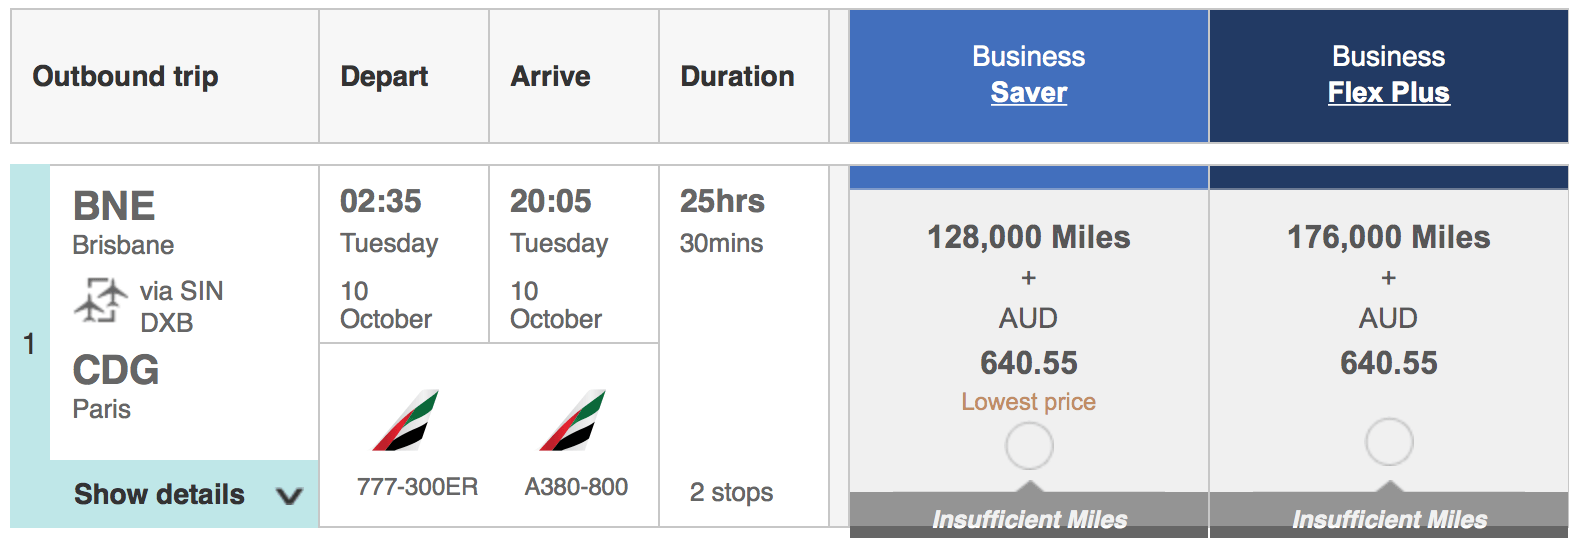 Emirates Business Saver and Emirates Business Flex Plus tickets for Brisbane to Paris